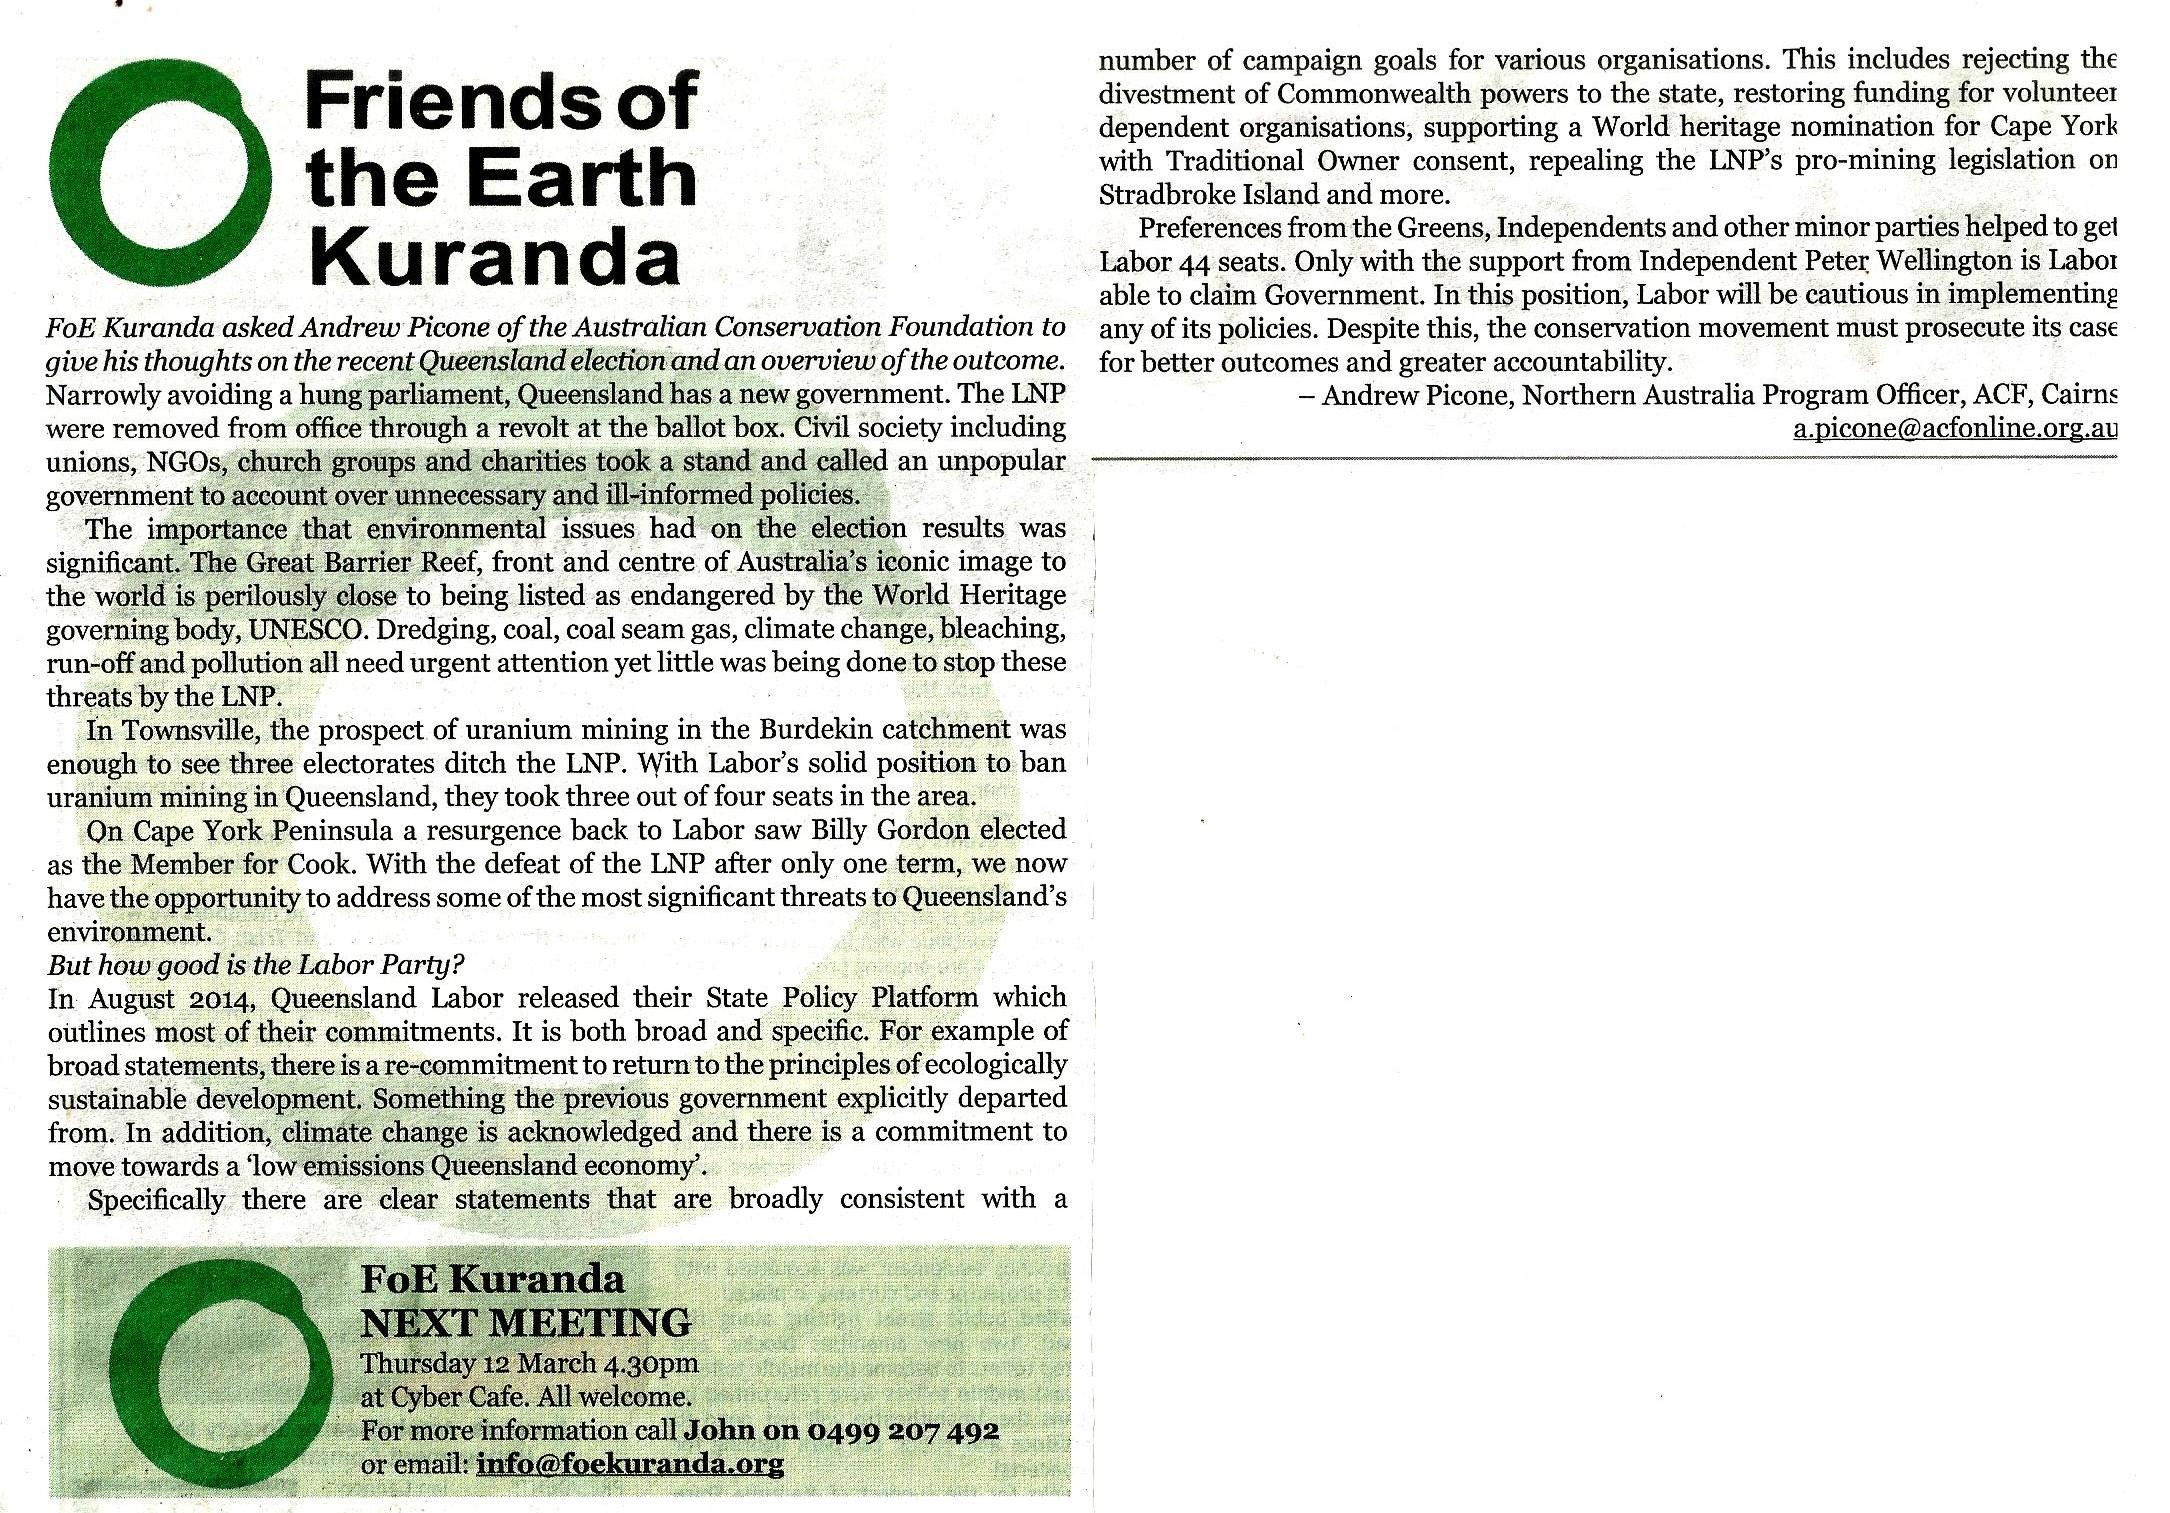 Kuranda-Paper-March-2014-3.jpg